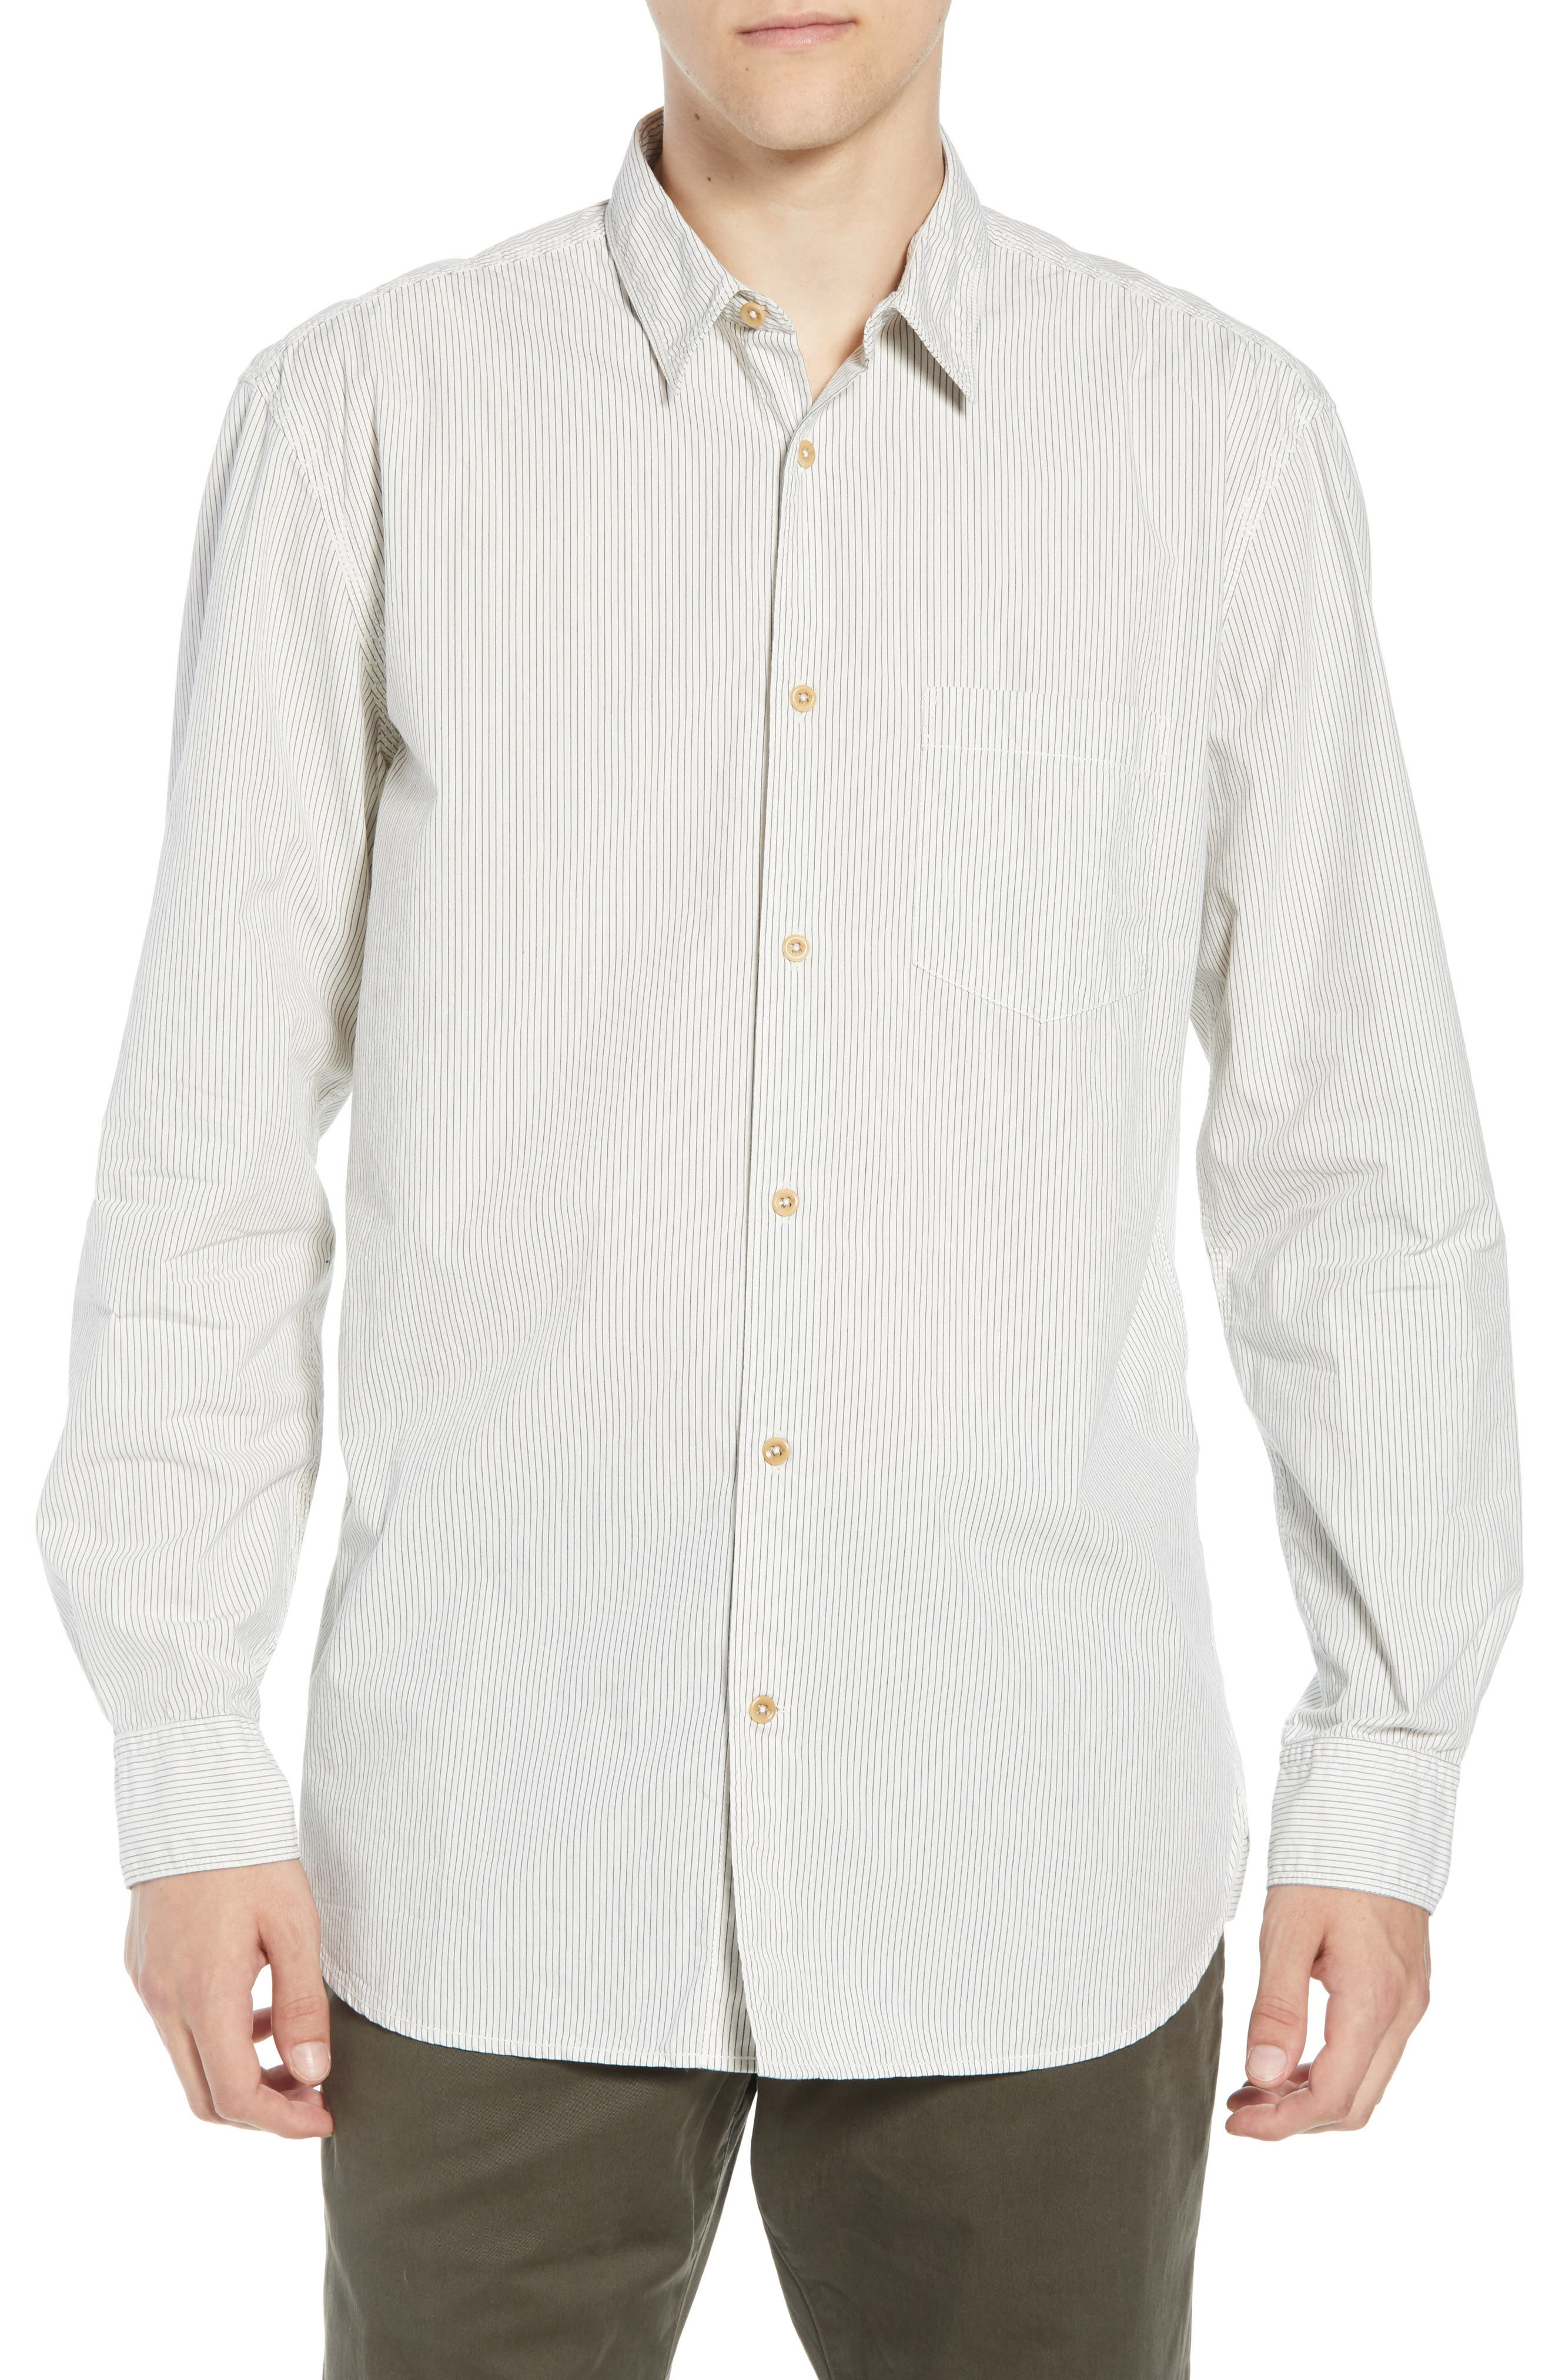 Core Peach Regular Fit Sport Shirt,                         Main,                         color, 400